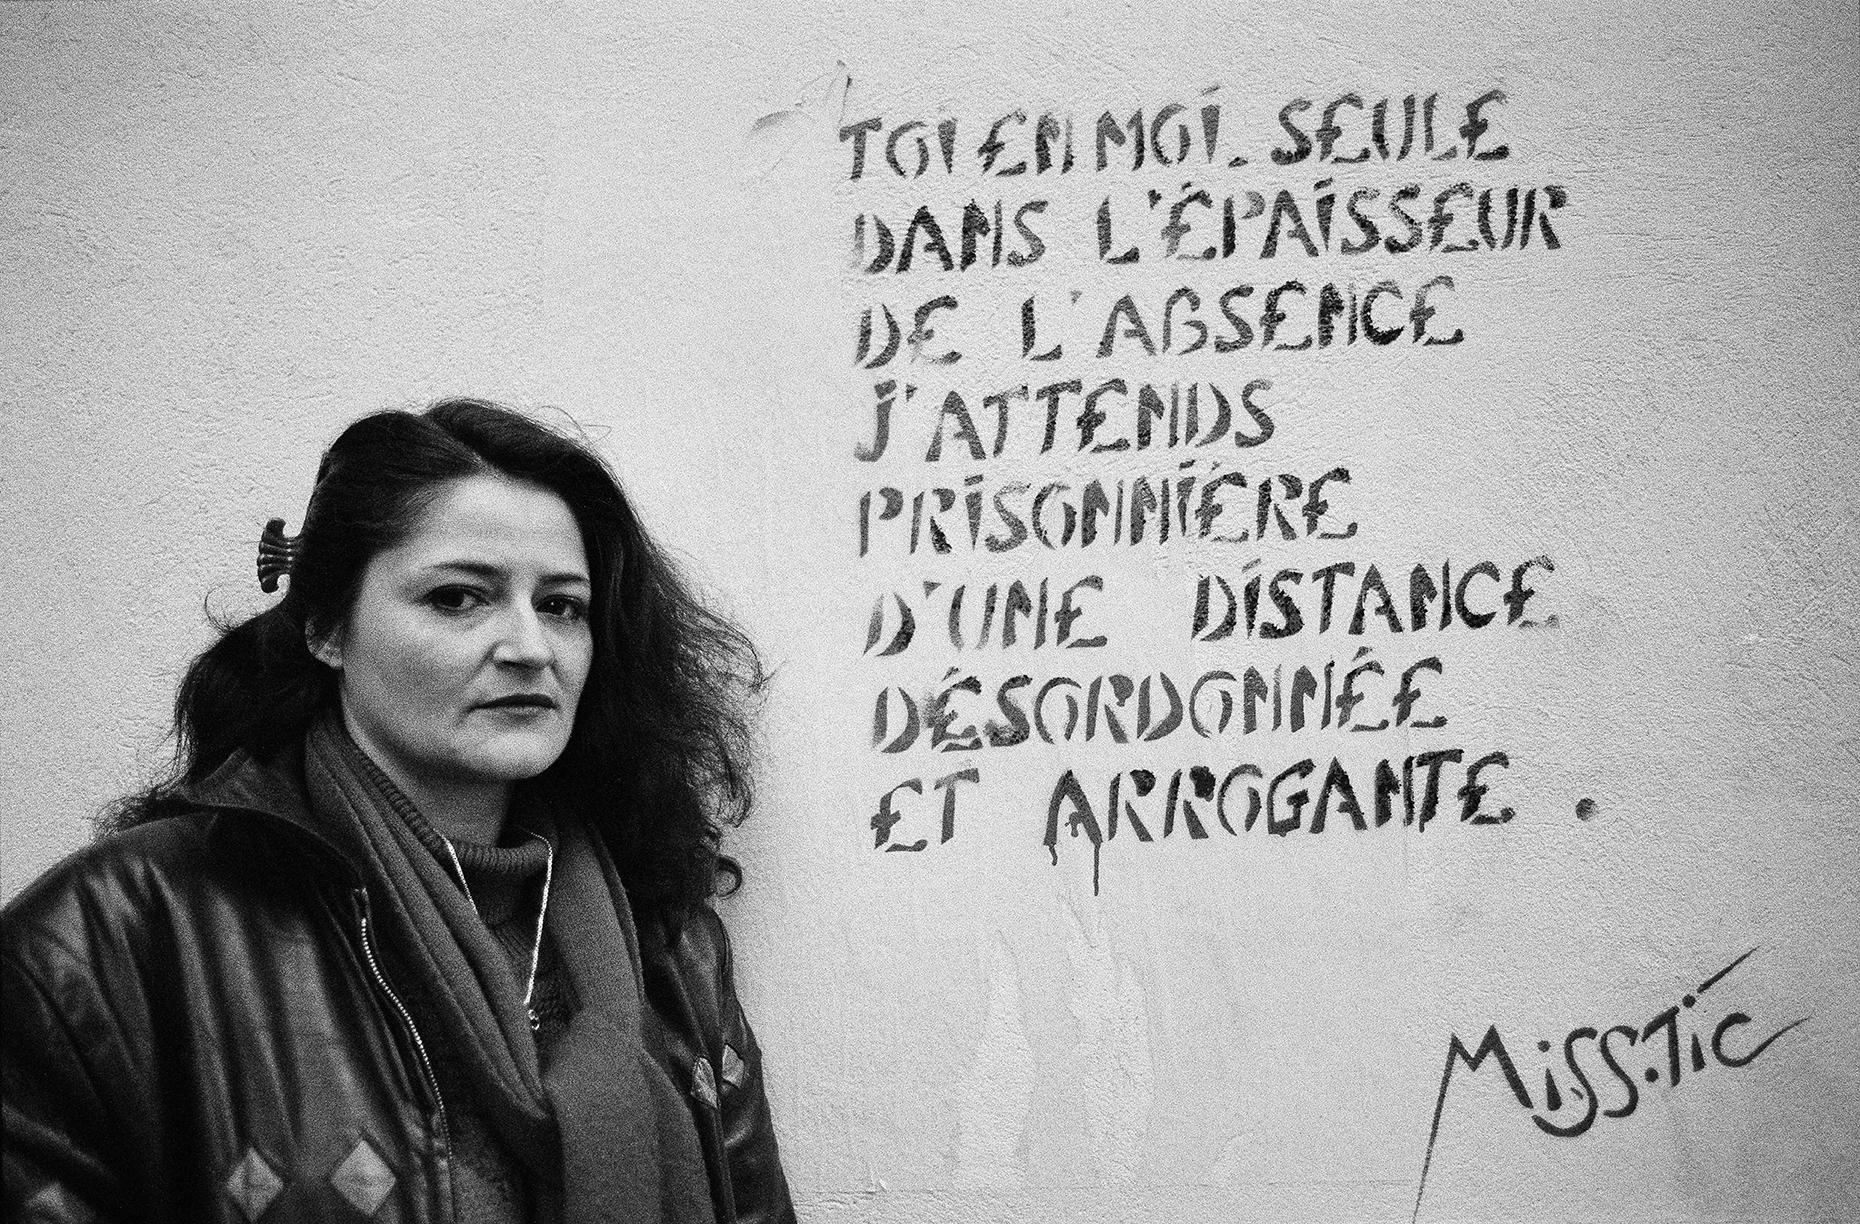 Miss.Tic, Paris,  Portrait Photograph of French Graffiti Artist